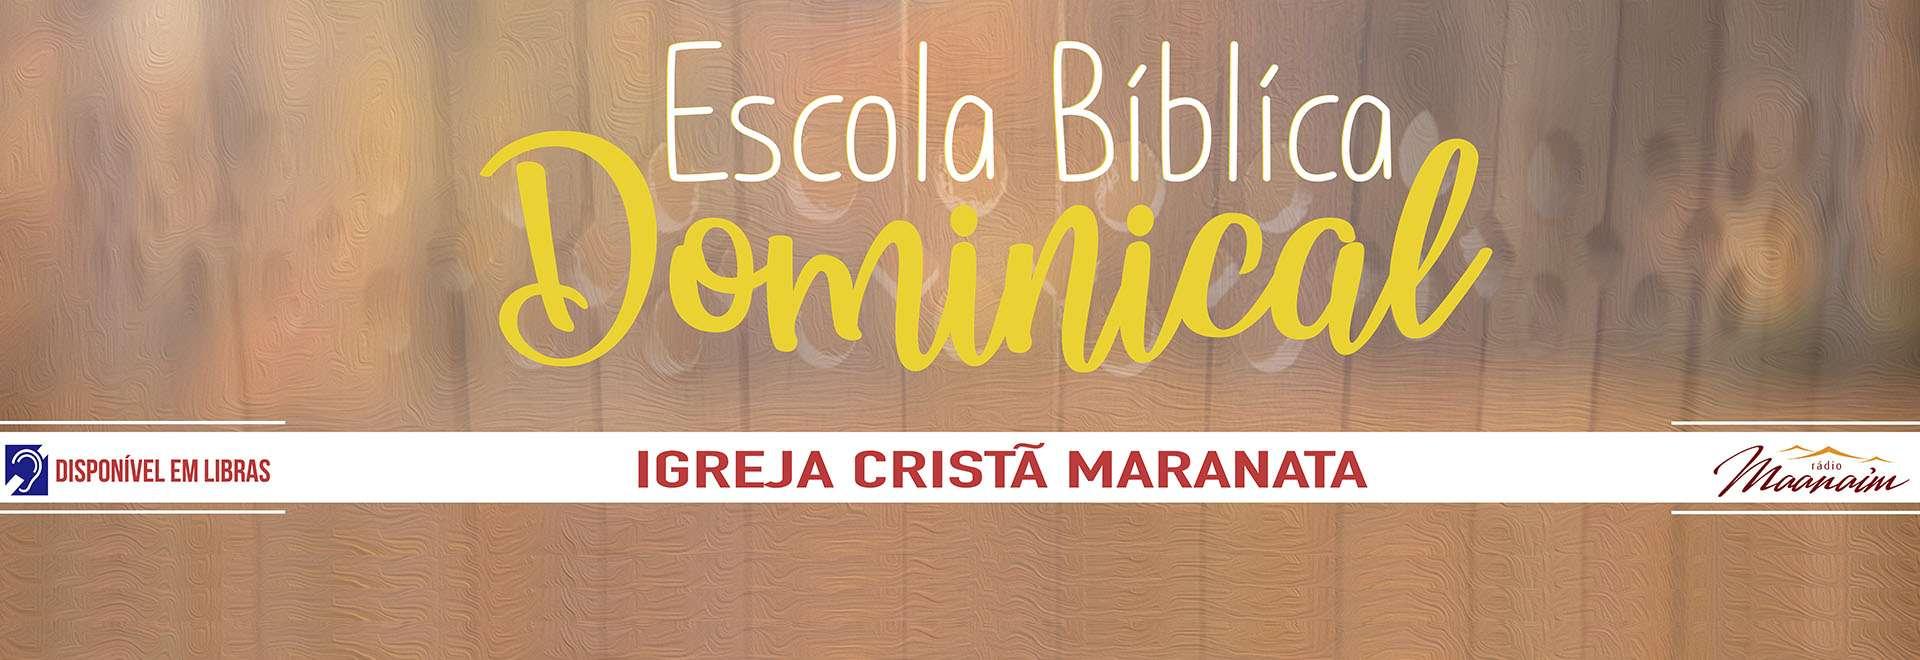 Participações da EBD da Igreja Cristã Maranata - 18/10/2020